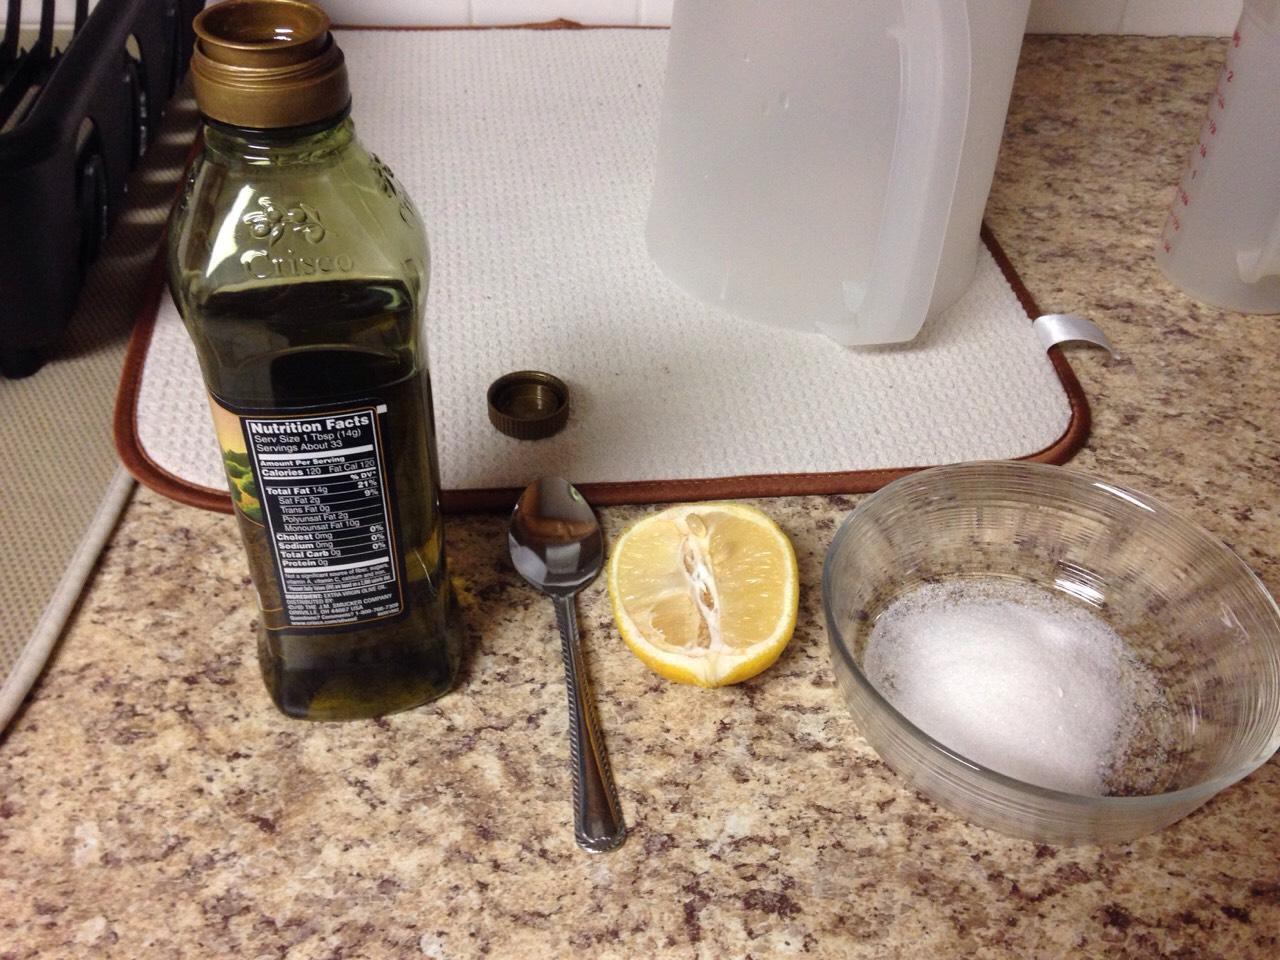 Ingredients-  Sugar Olive oil Lemon(optional)